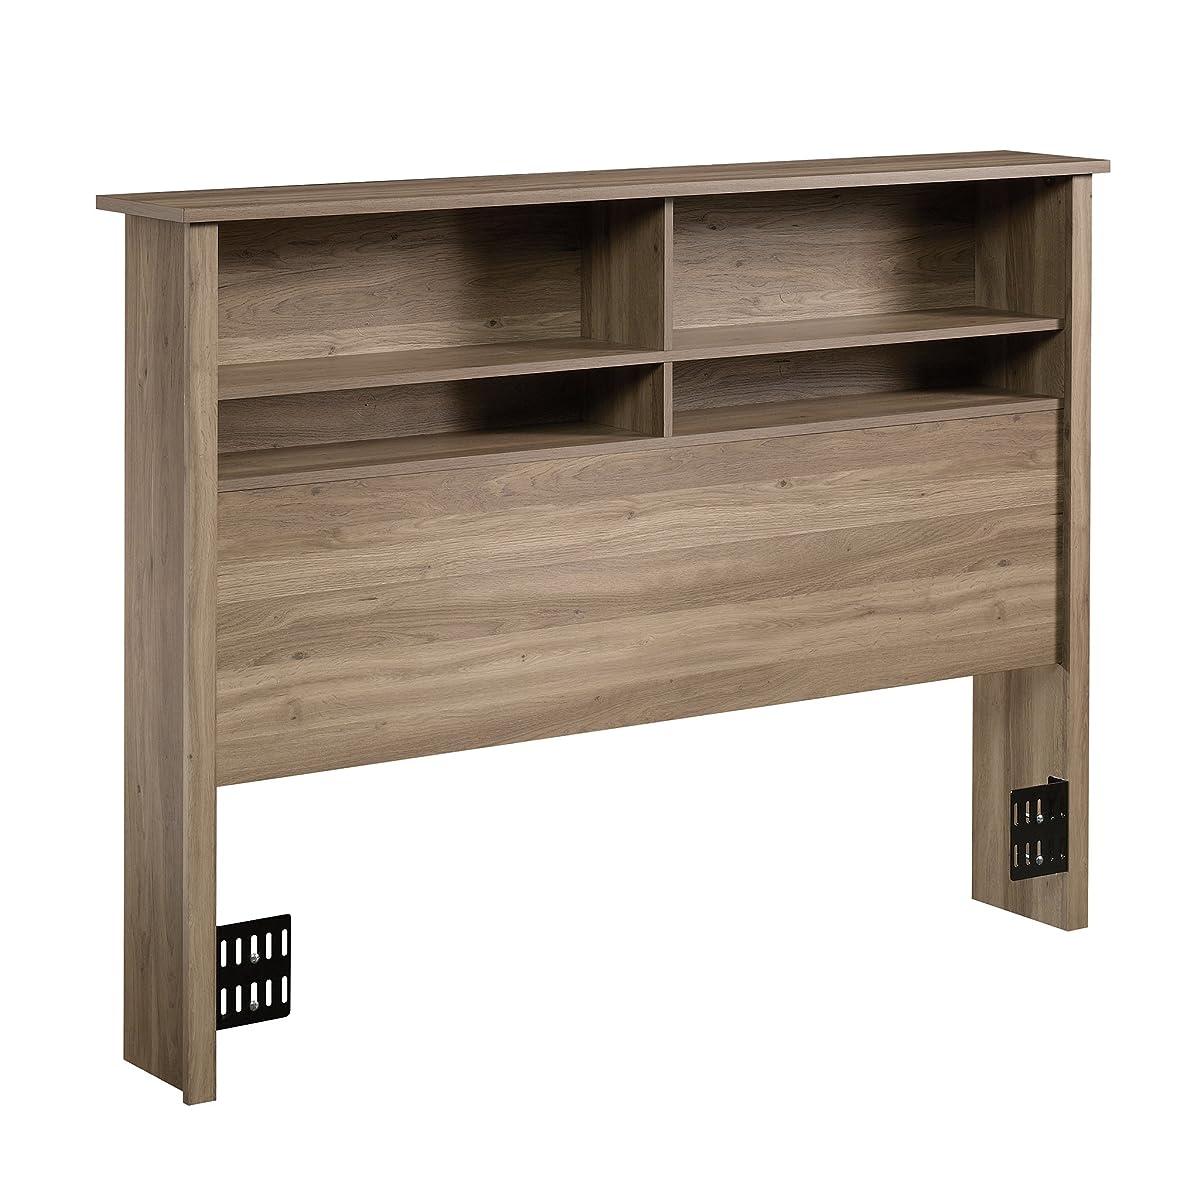 Sauder 419321 County Line Full/Queen Bookcase Headboard, Salt Oak Finish